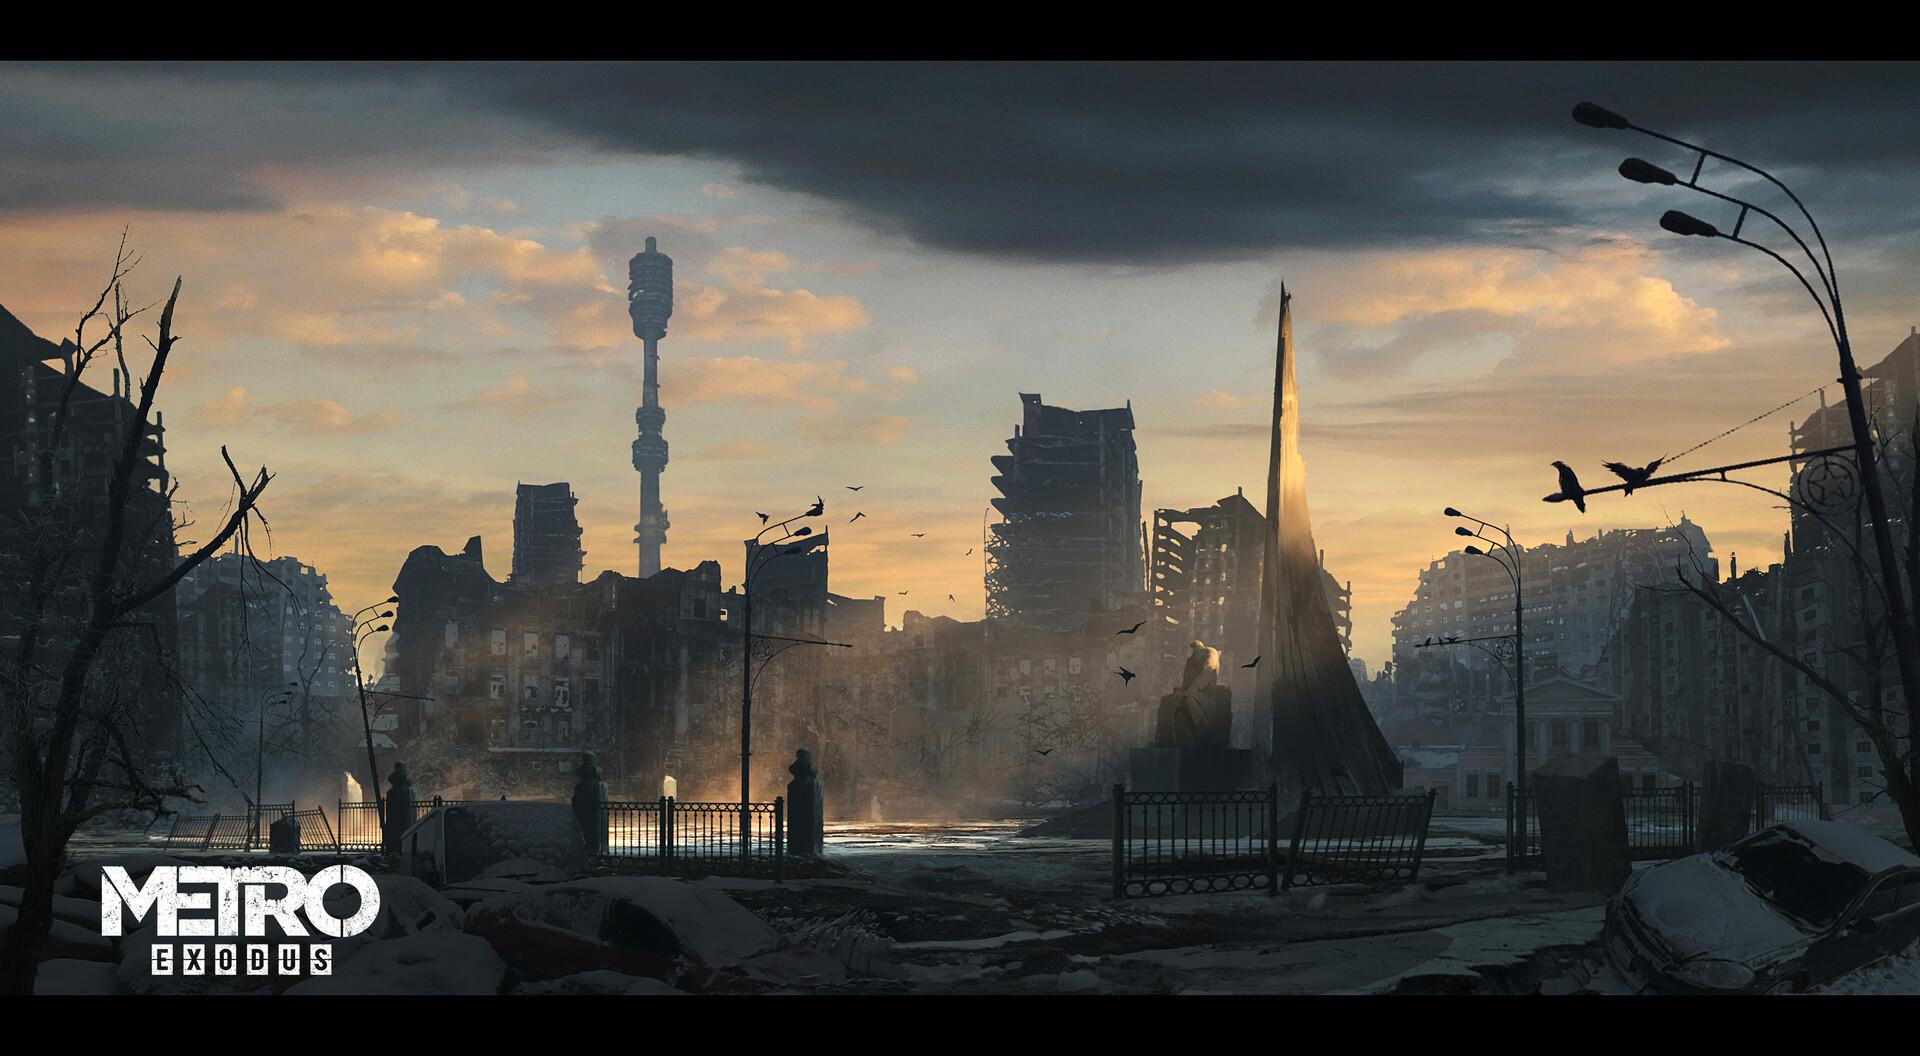 Metro Exodus Concept Art by Rostyslav Zagornov